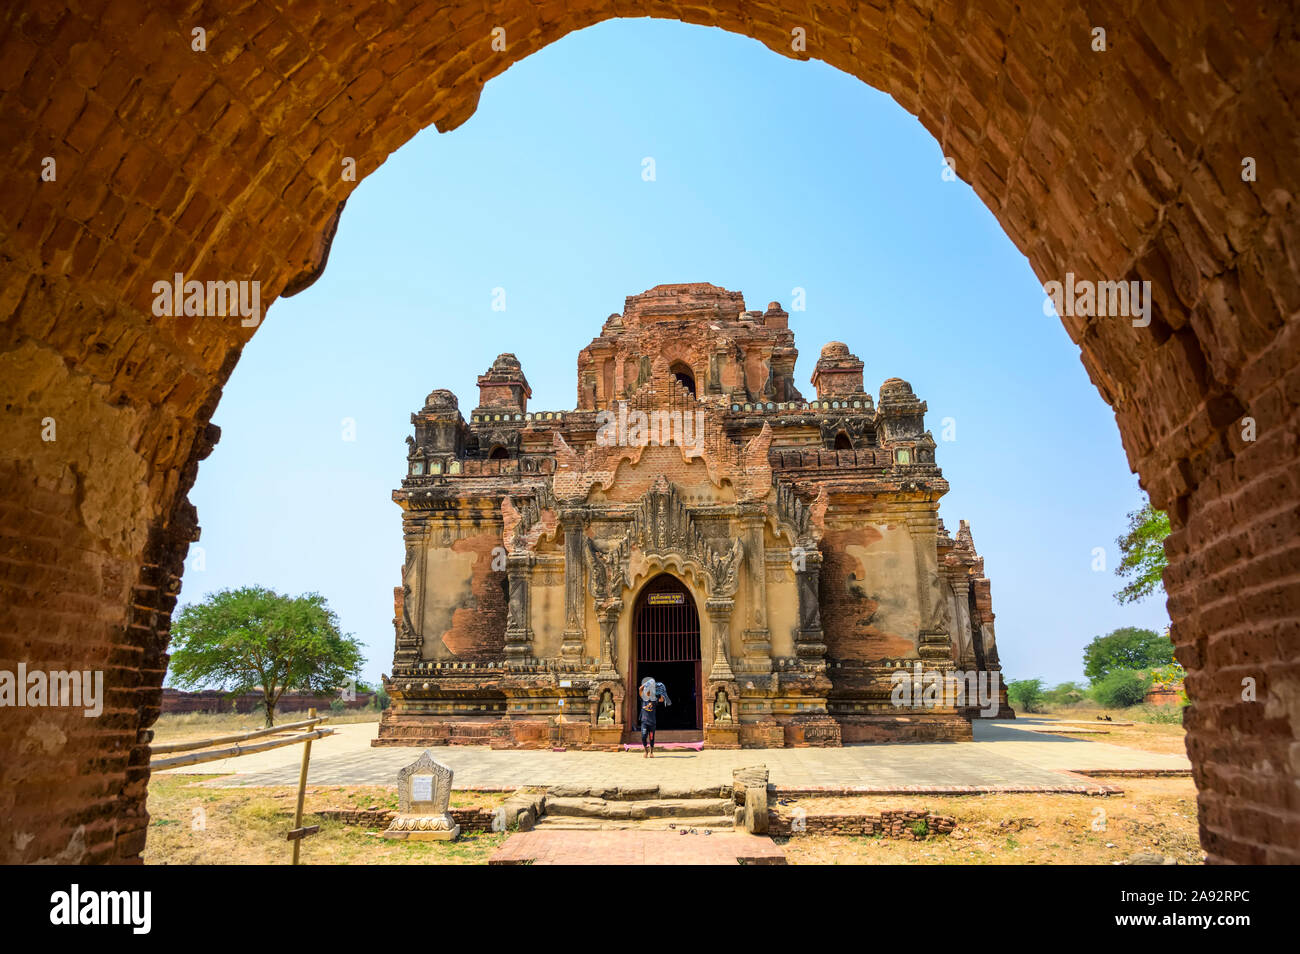 Buddhist temple; Bagan, Mandalay Region, Myanmar Stock Photo